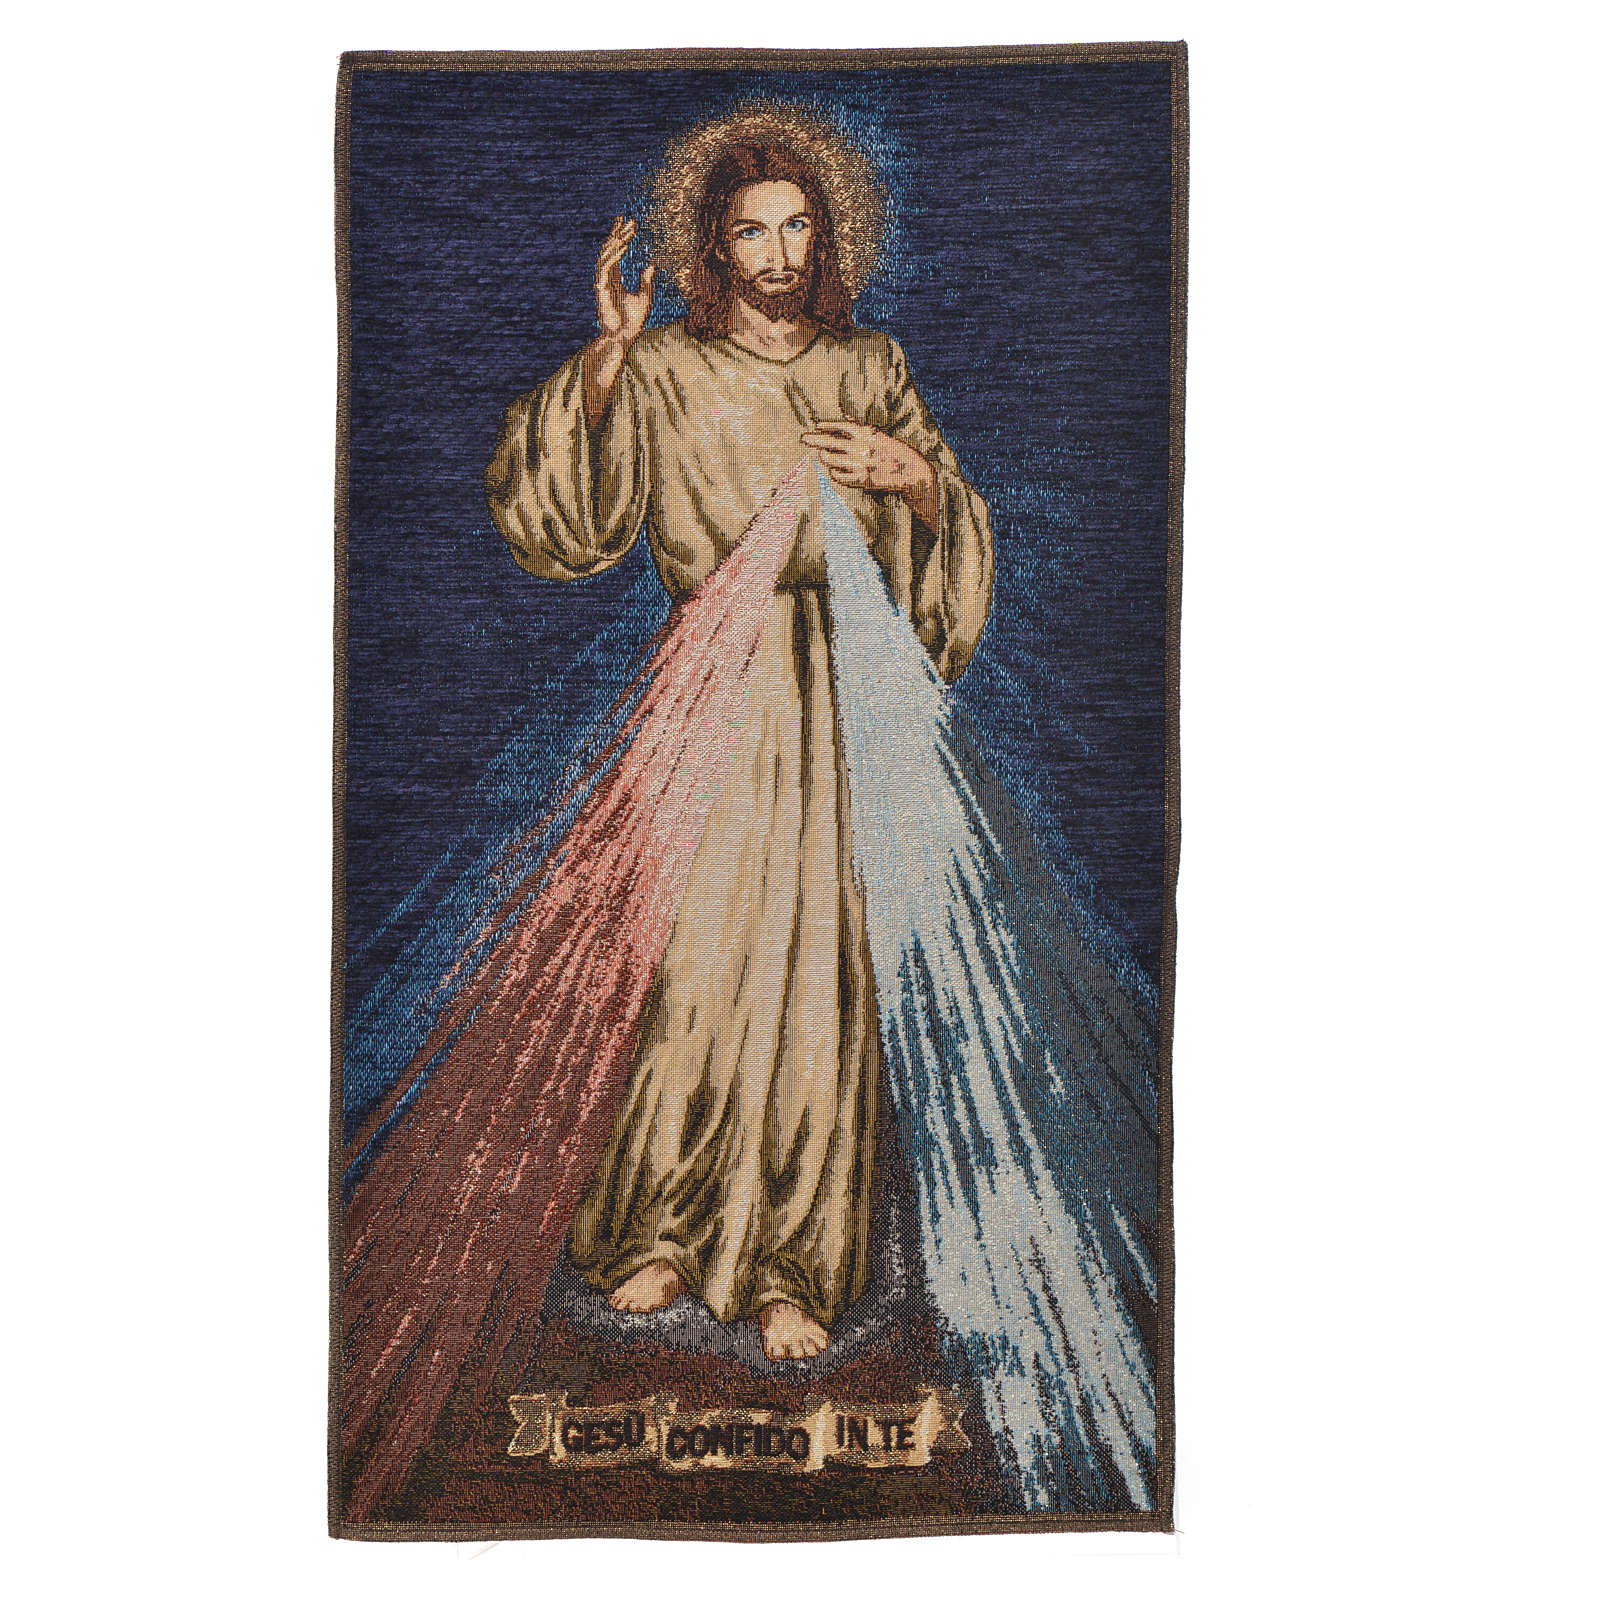 Wandteppich Barmherziger Jesus 3